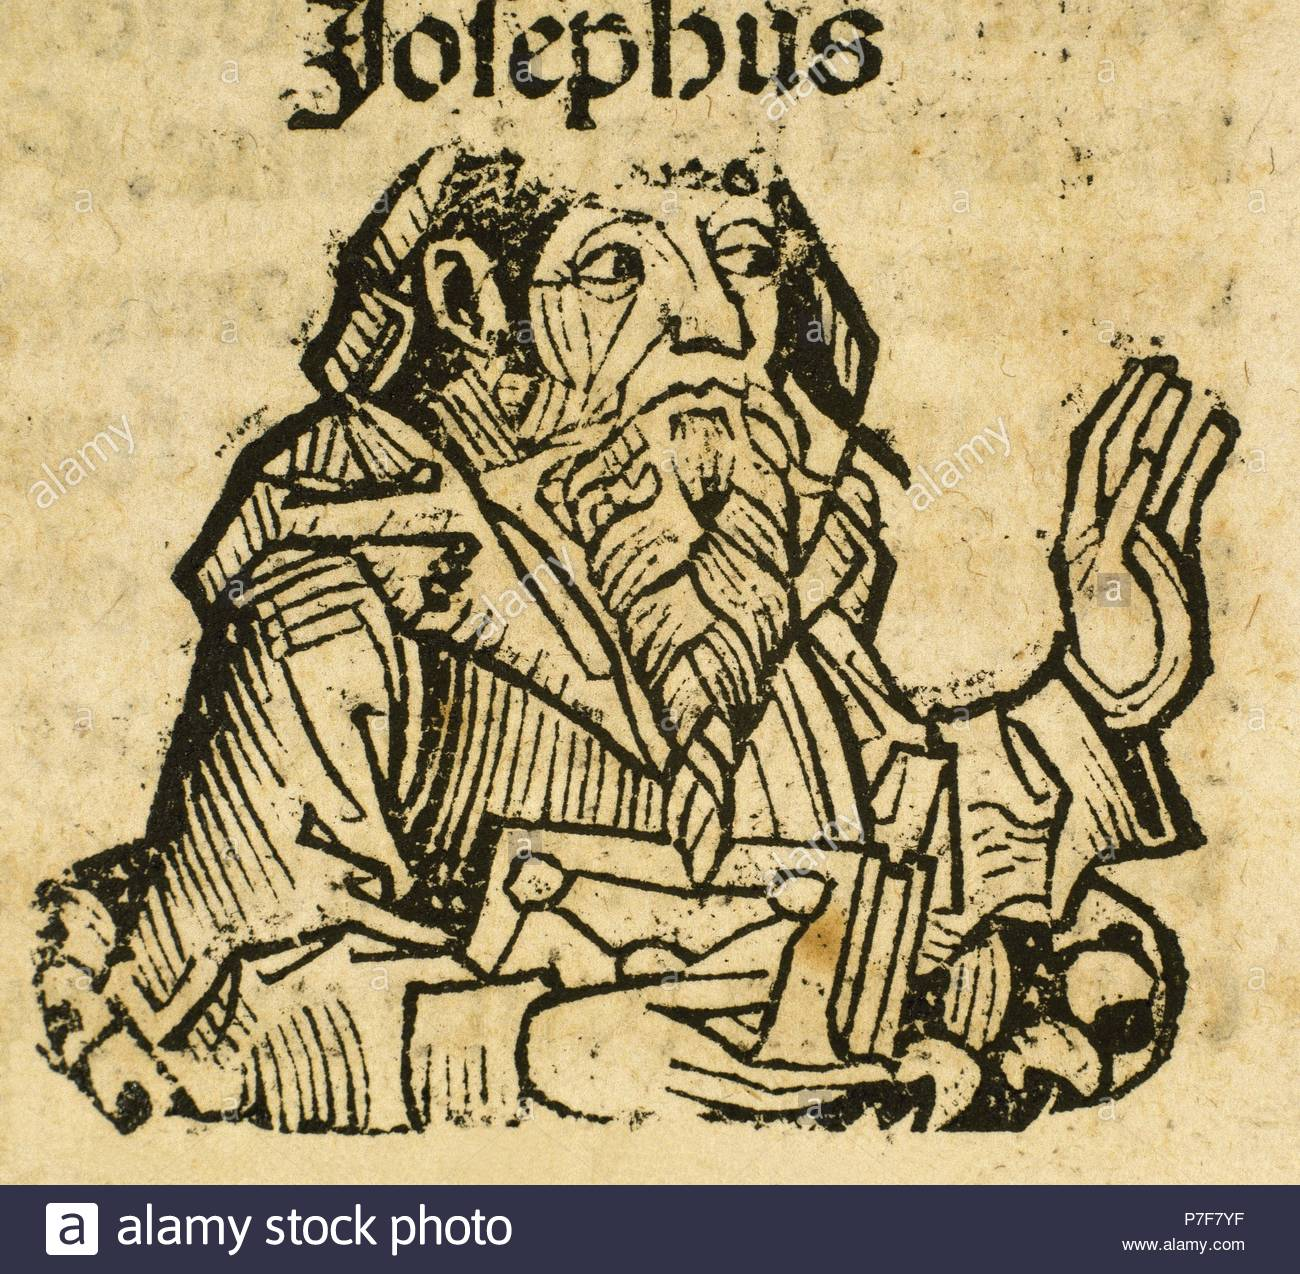 Titus Flavius Josephus (37-100 A.B). First-century Romano-Jewish scholar,  historian and hagiographer. Portrait. Engraving, 16th century.